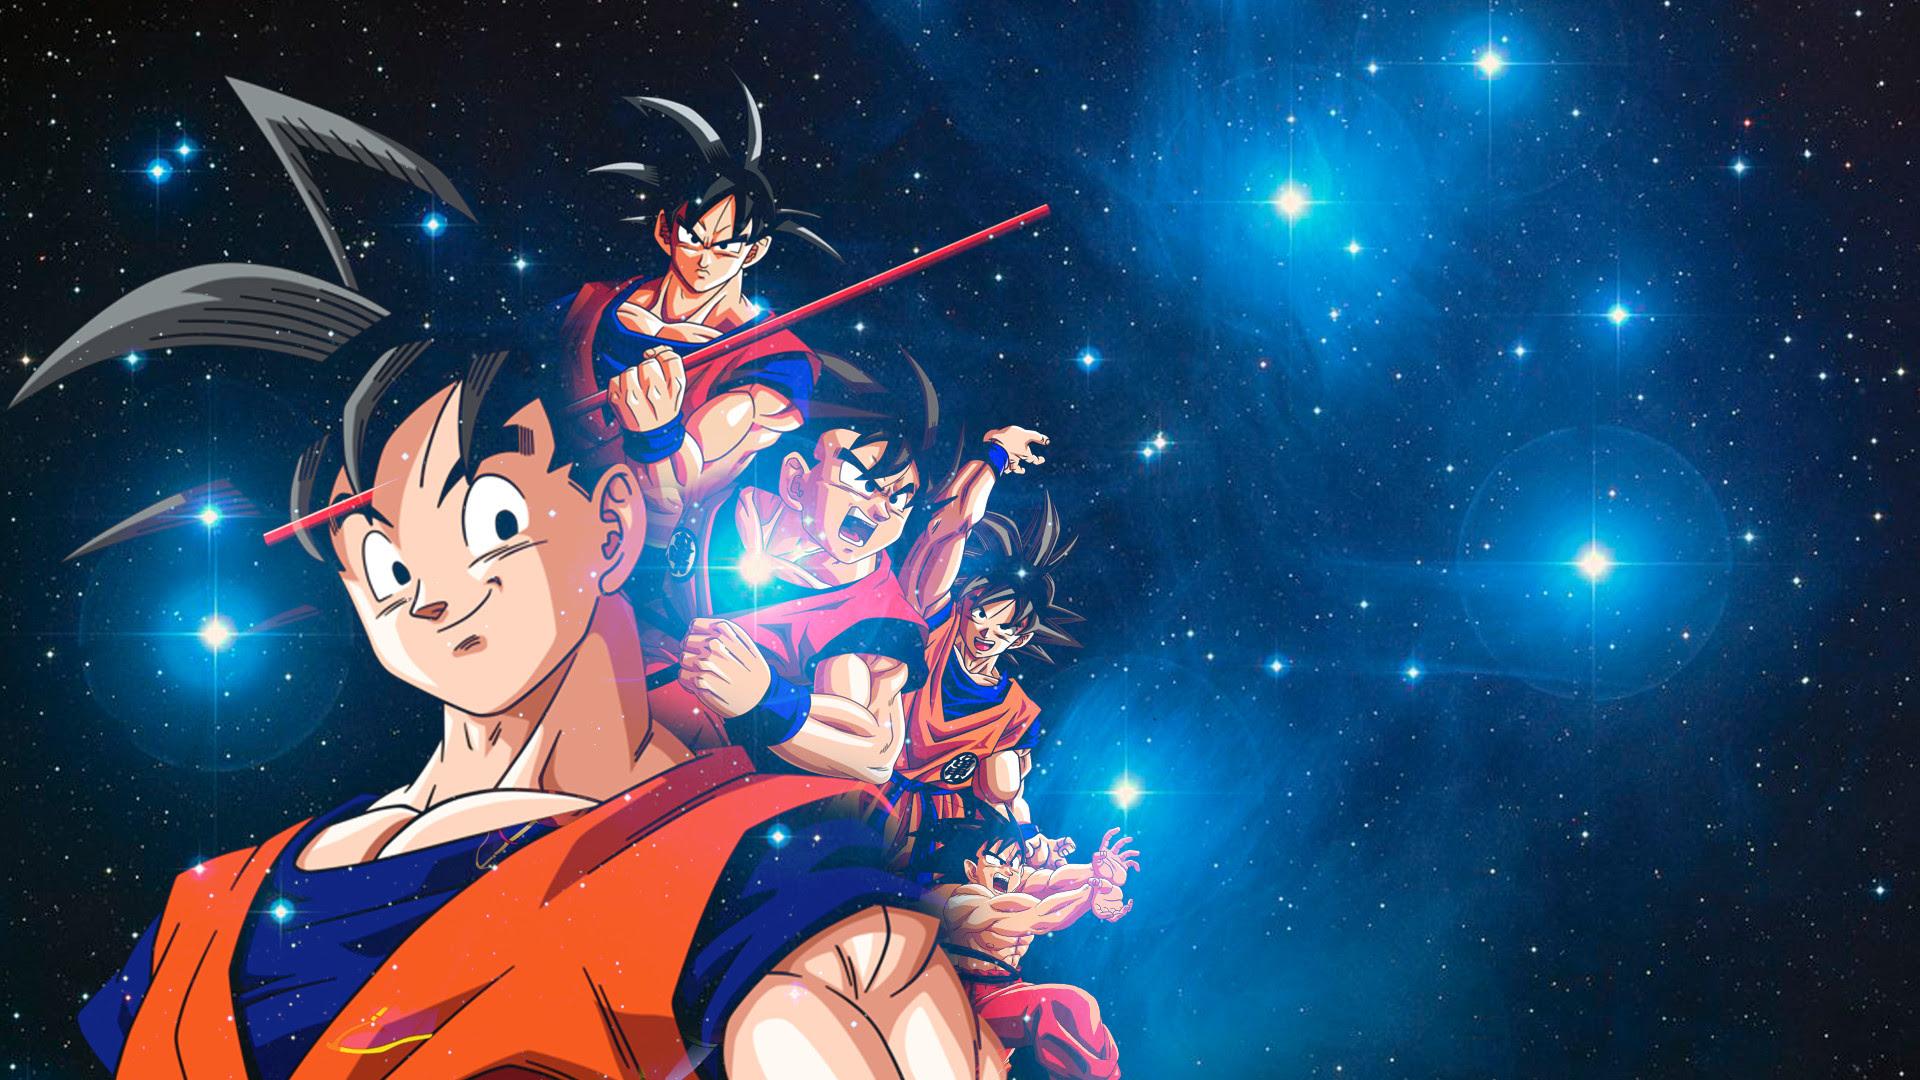 1080p Ultra Hd Goku Wallpaper 4k Gambarku